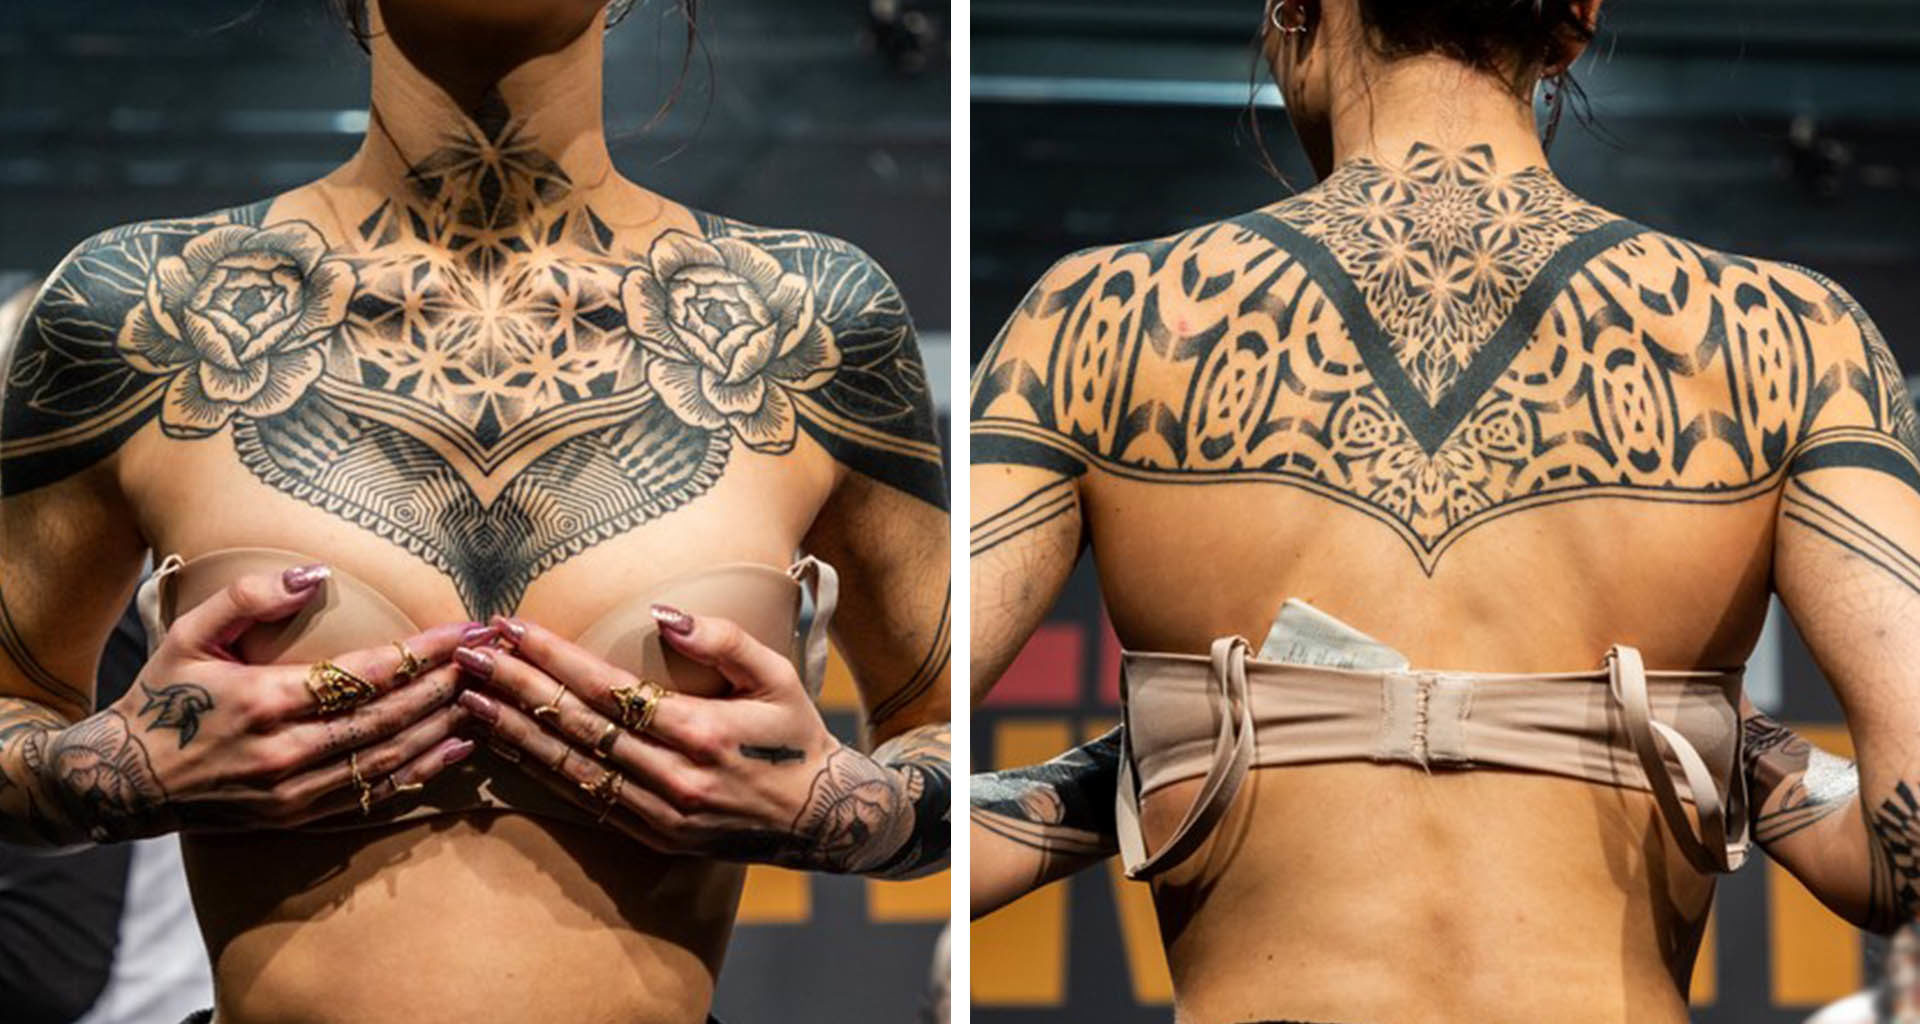 tatouage-en-france-qui-se-tatoue-en-france